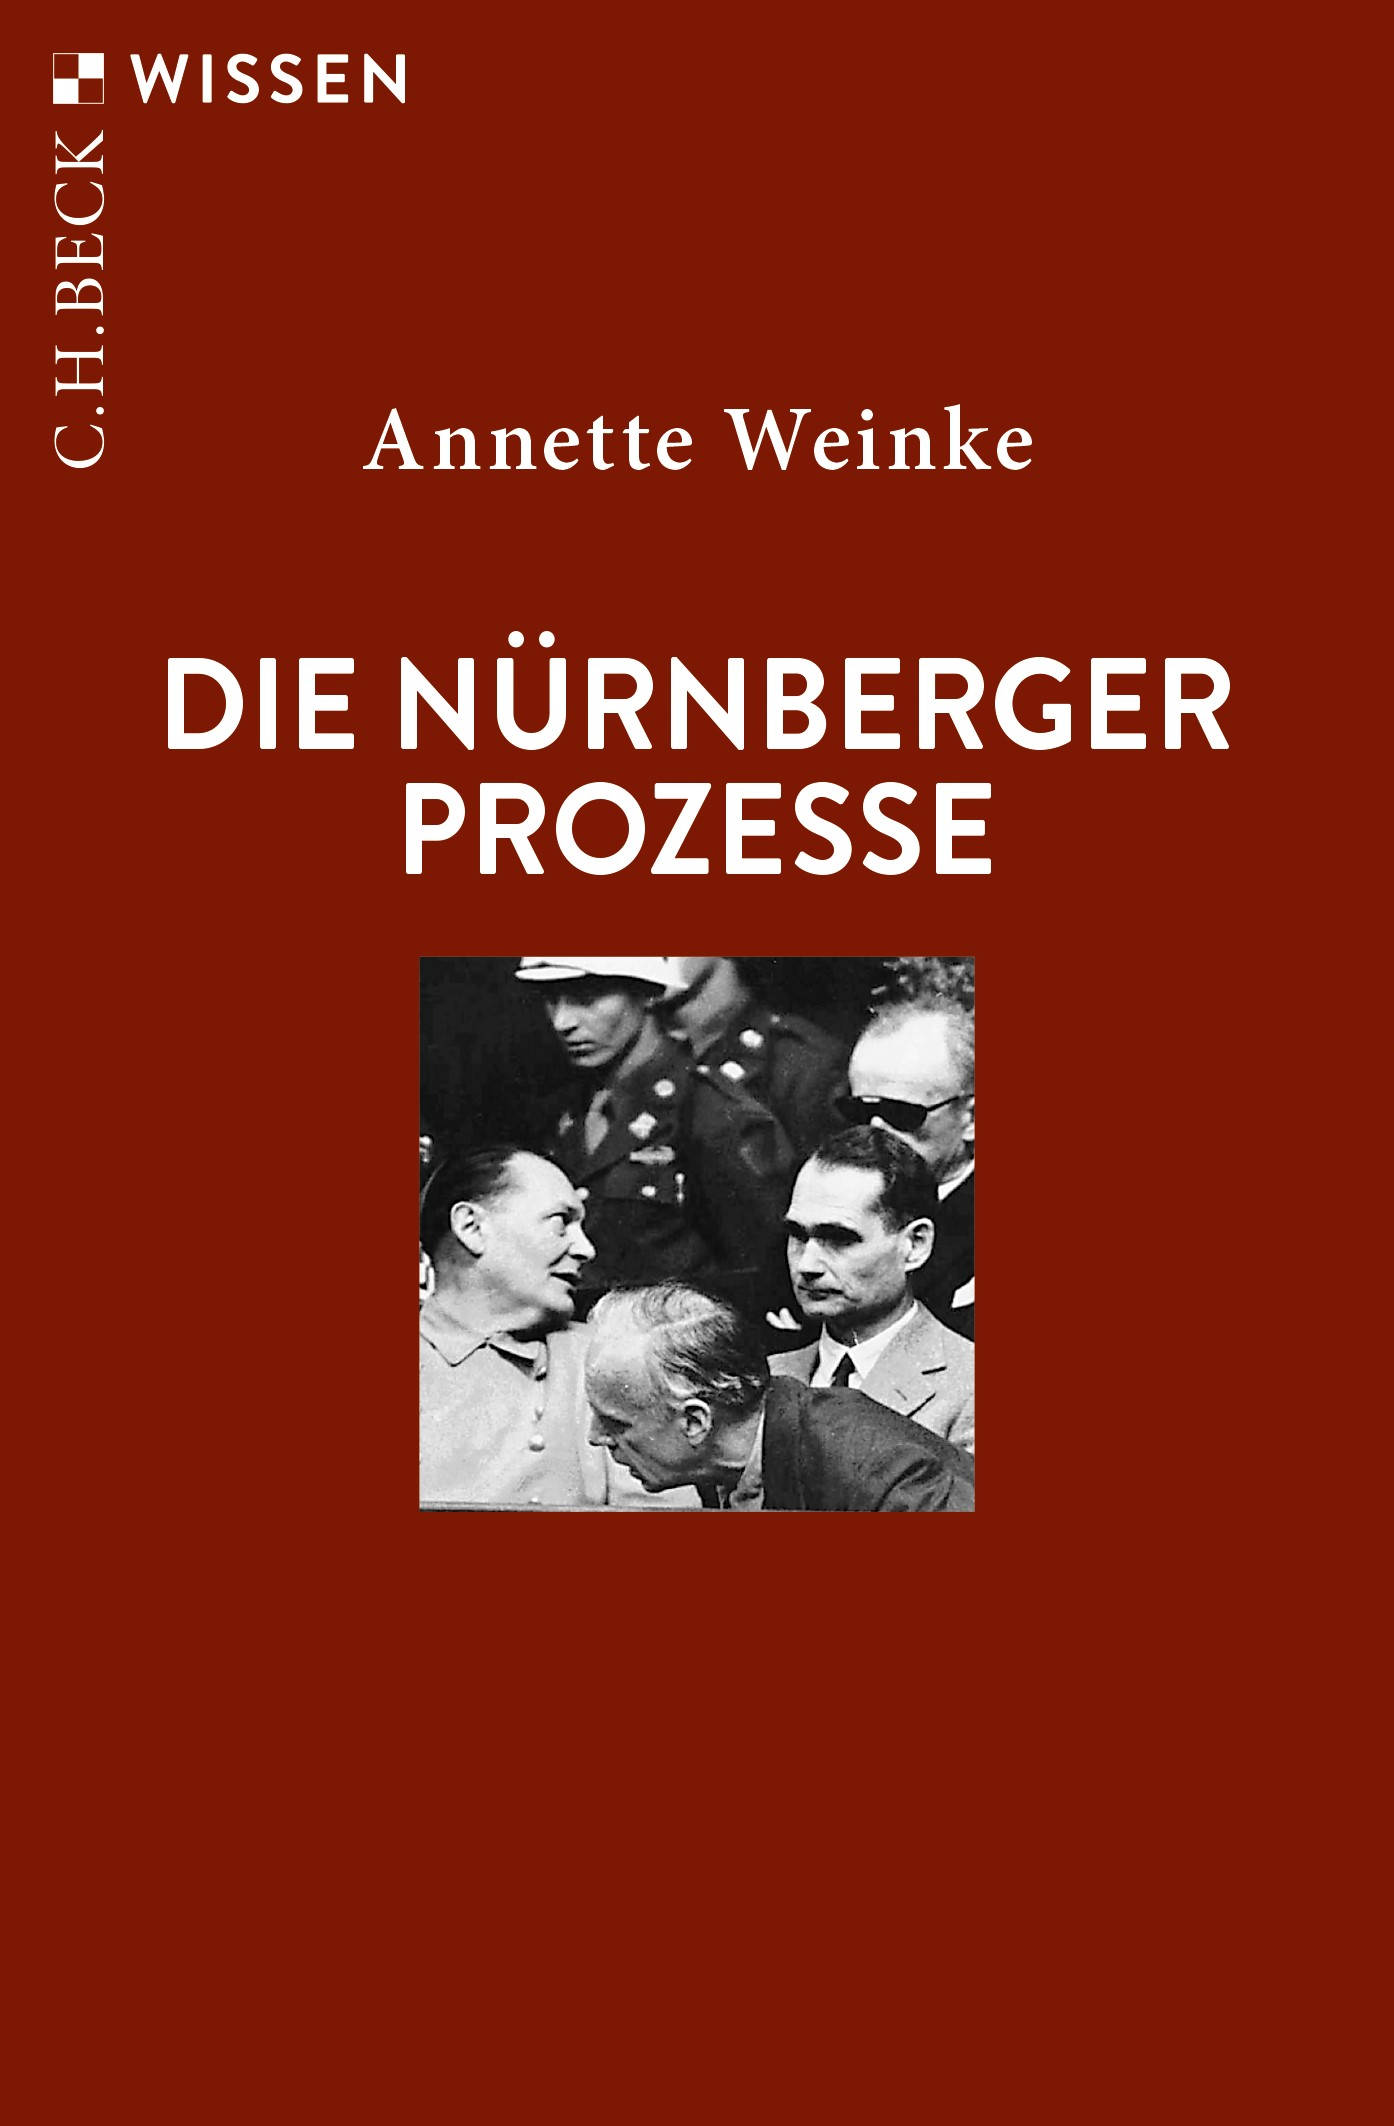 Cover des Buches 'Die Nürnberger Prozesse'